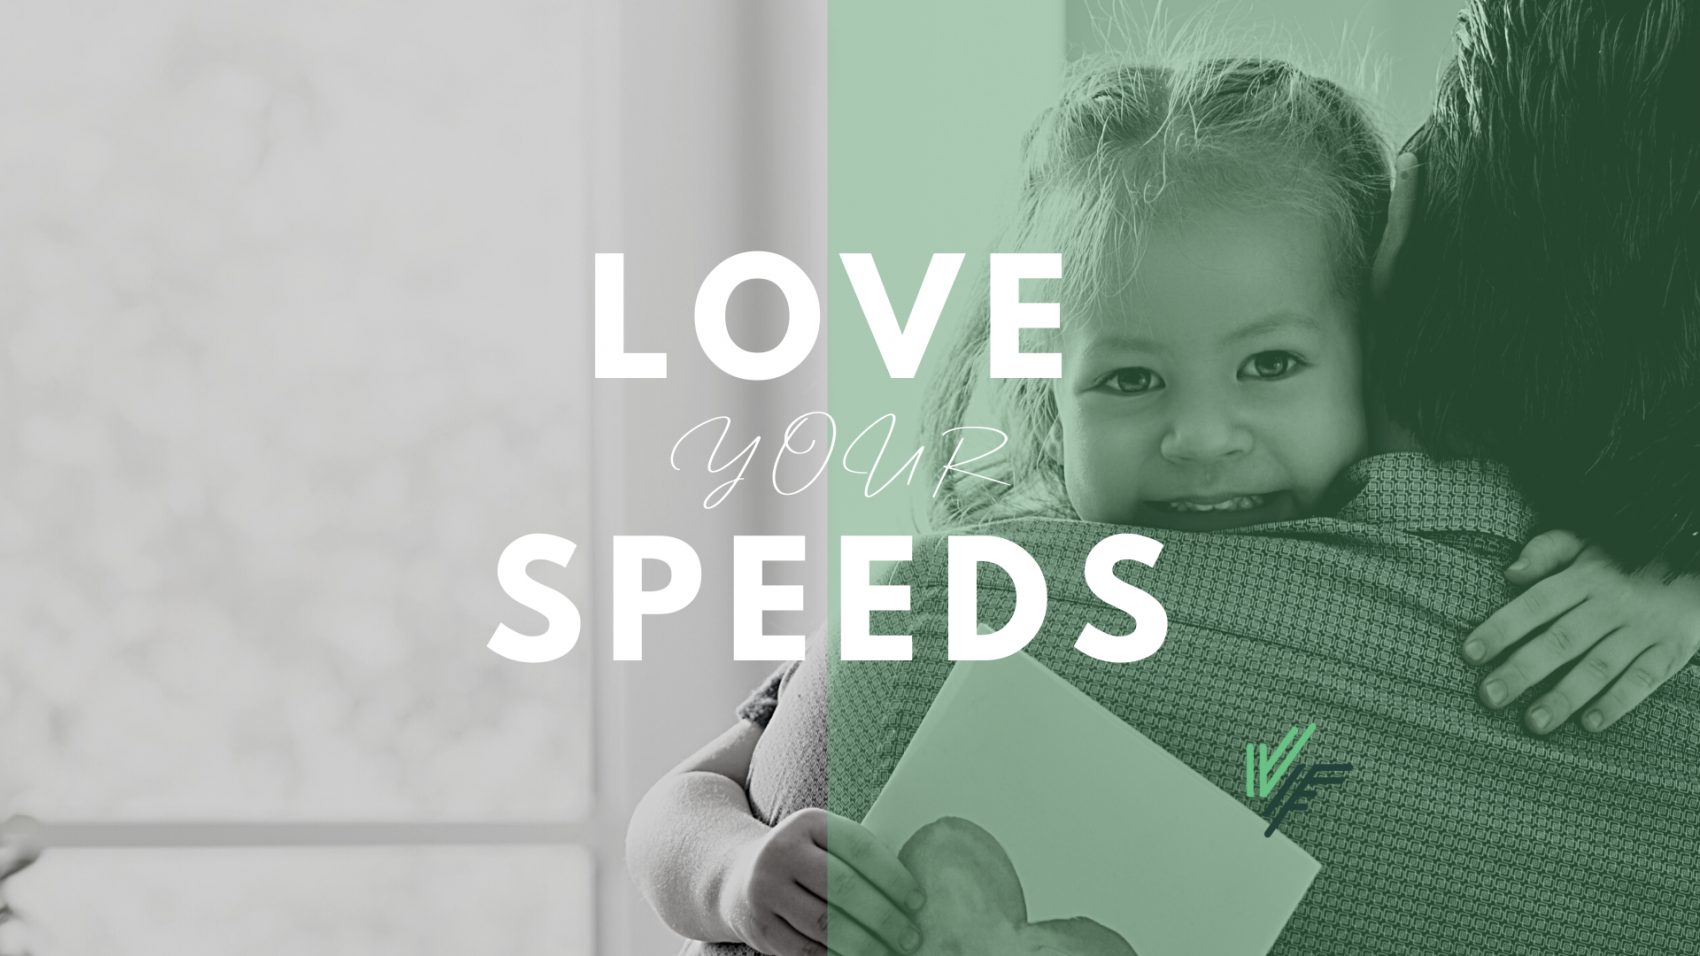 Love your speeds